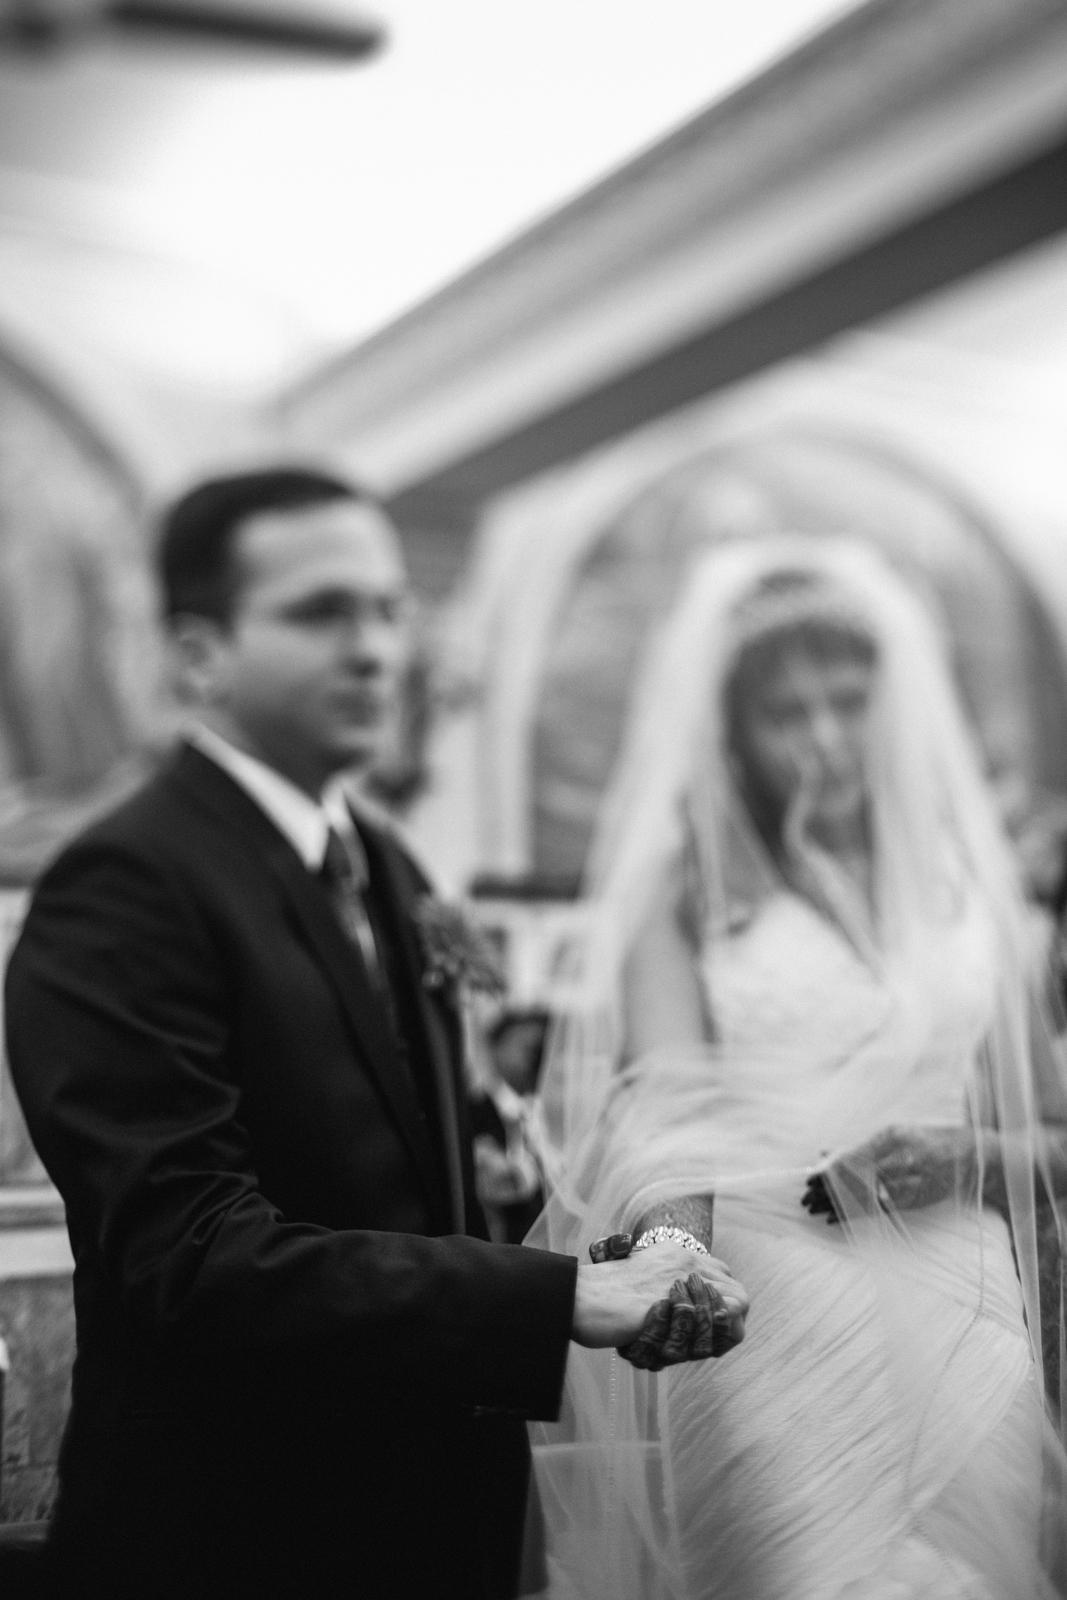 church-wedding-mumbai-into-candid-photography-6255.jpg